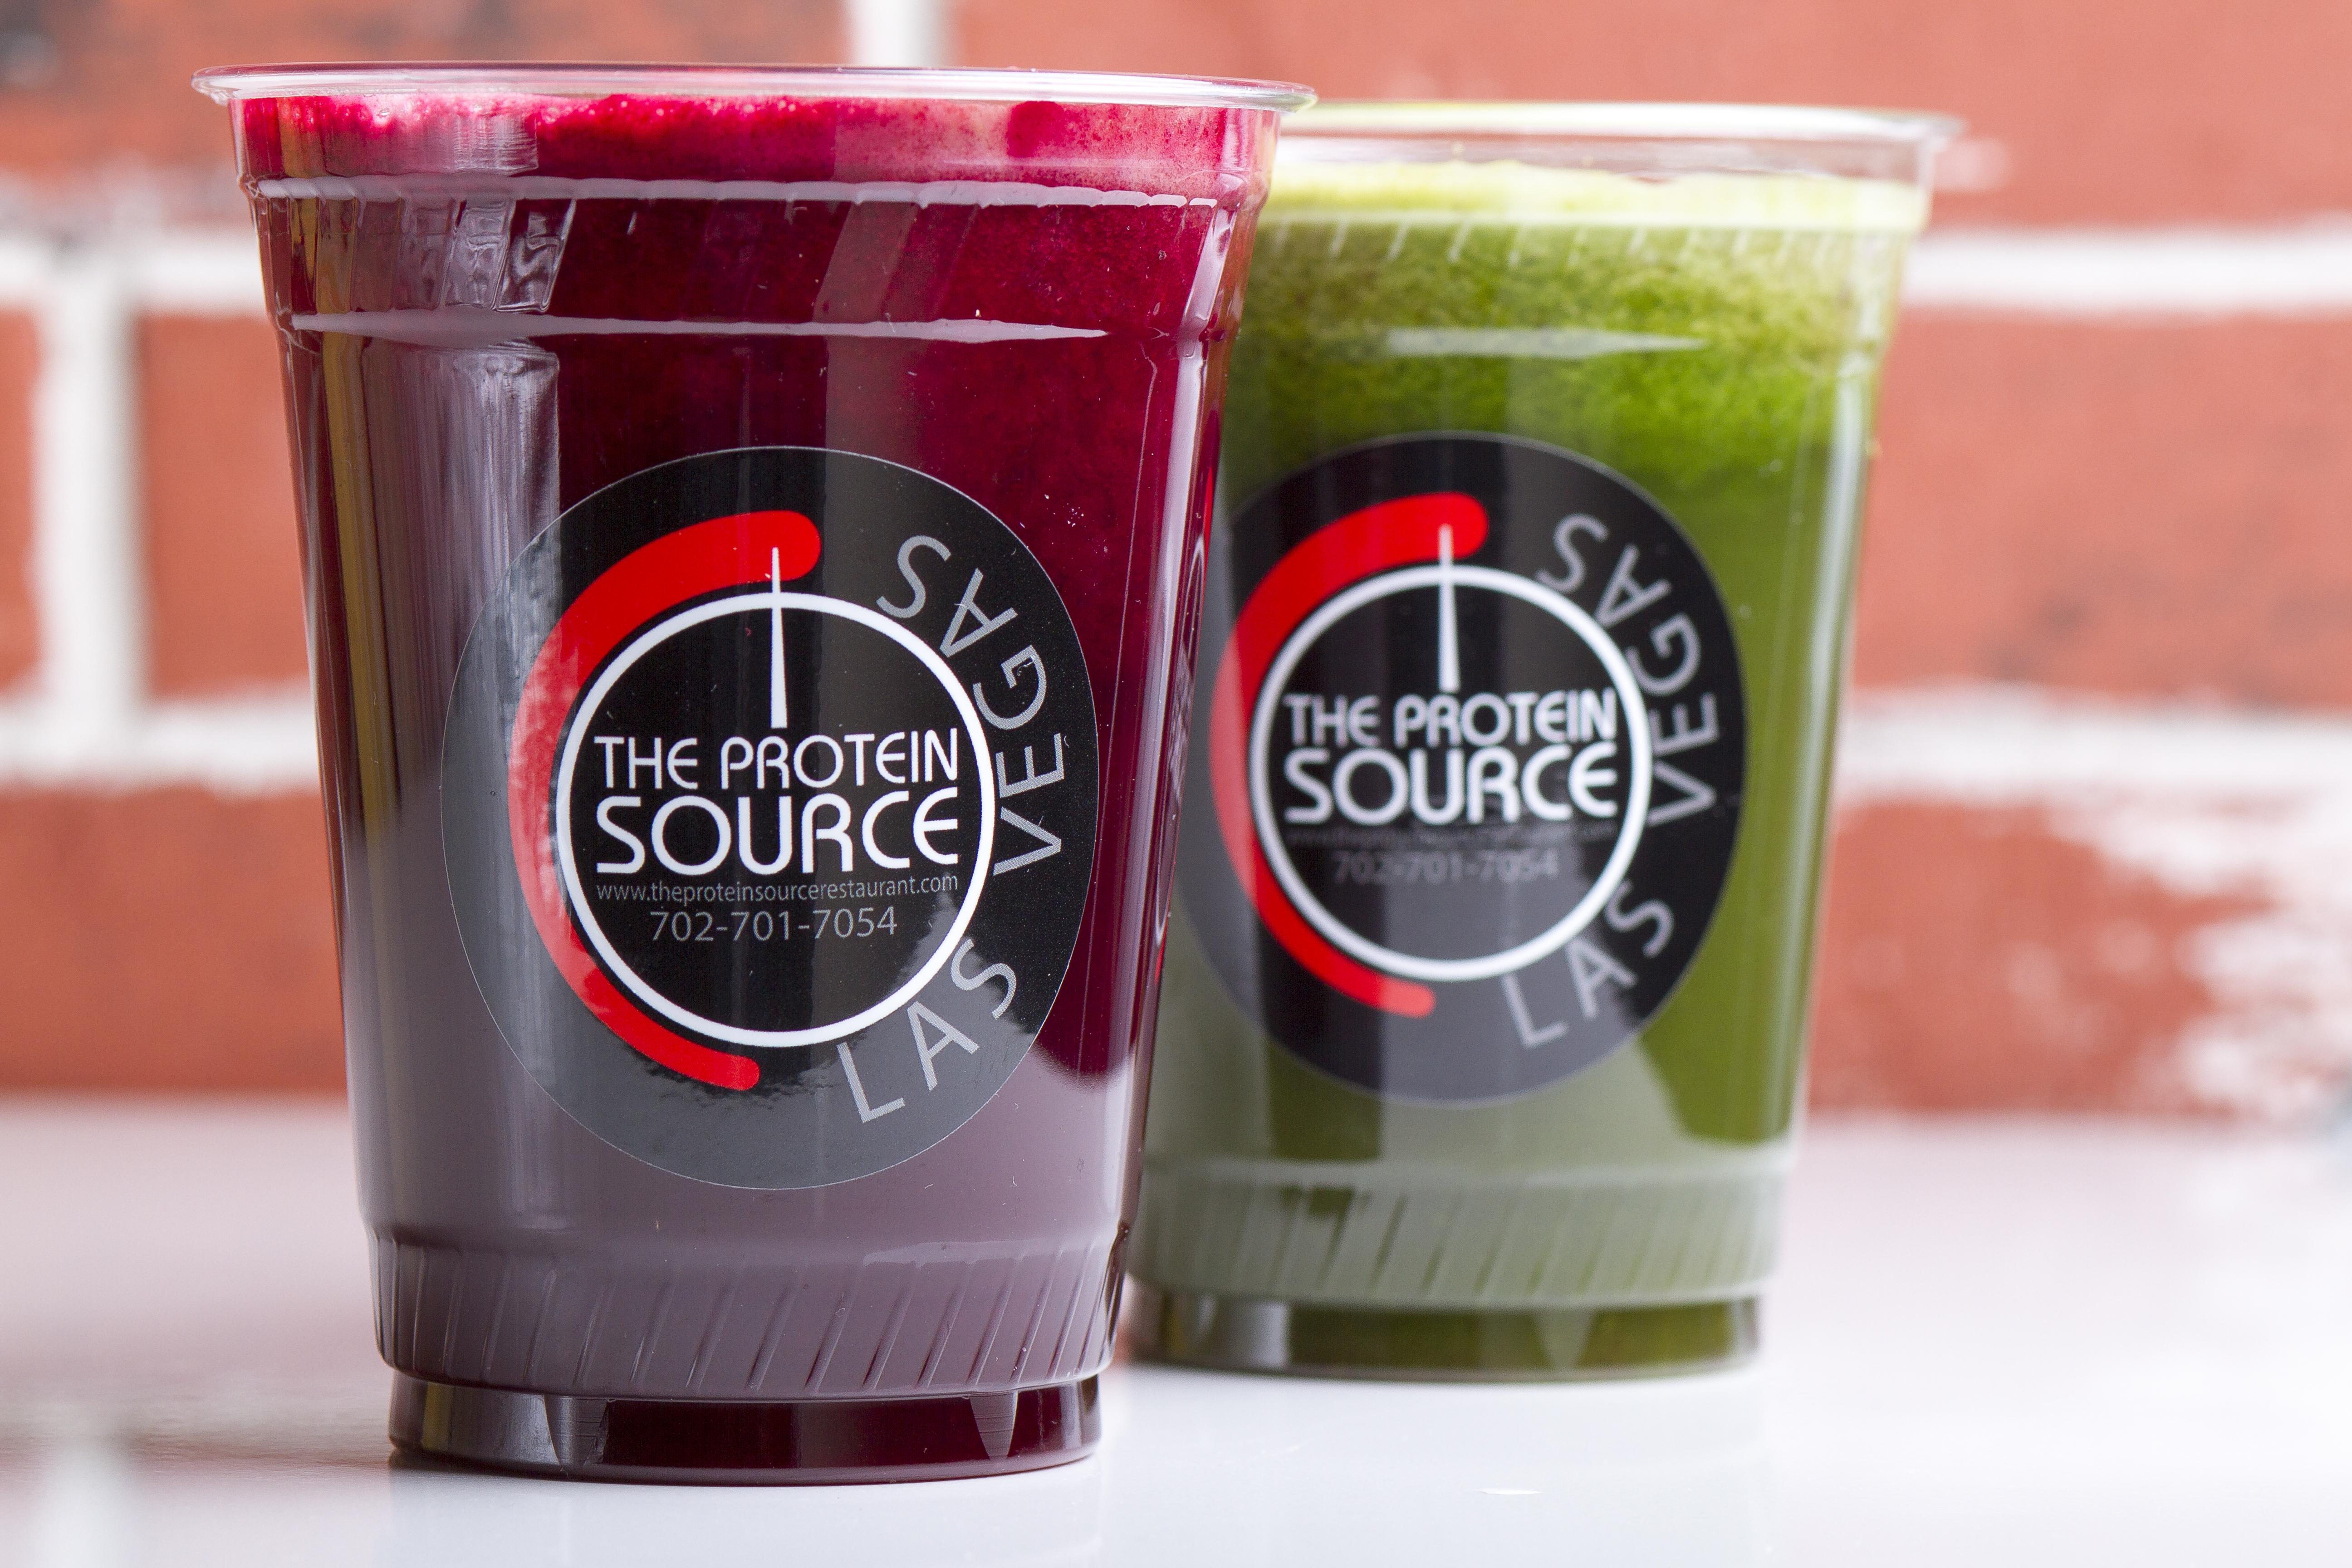 Juice The Protein Source Restaurant